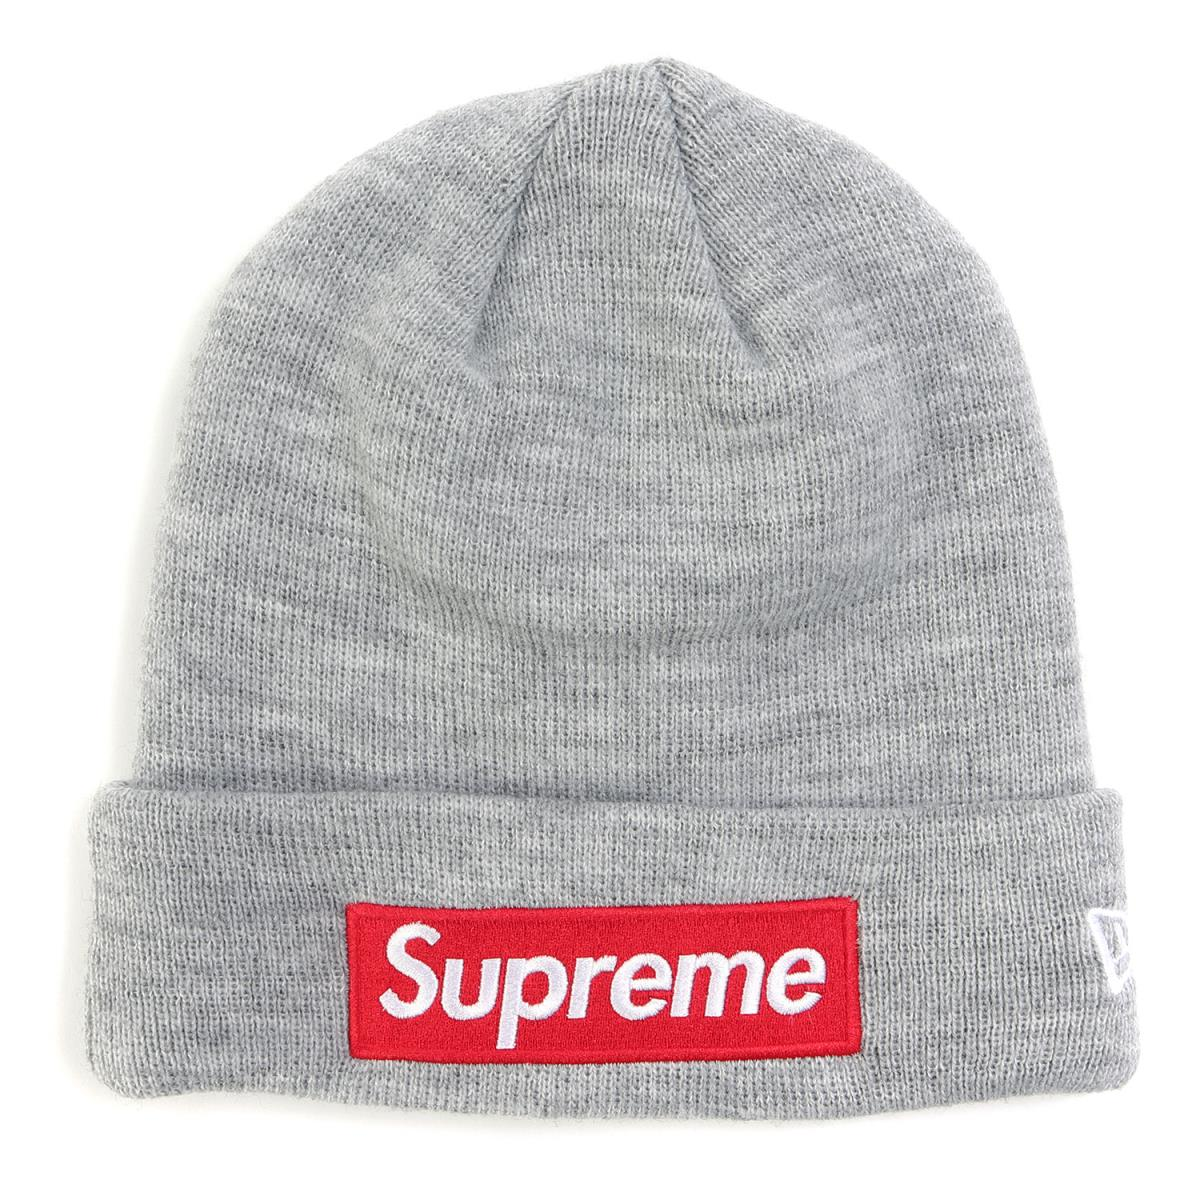 Supreme (シュプリーム) 18A/W ×NEW ERA BOXロゴアクリルニットビーニー(Box Logo Beanie) ヘザーグレー 【メンズ】【美品】【K2204】【中古】【あす楽☆対応可】